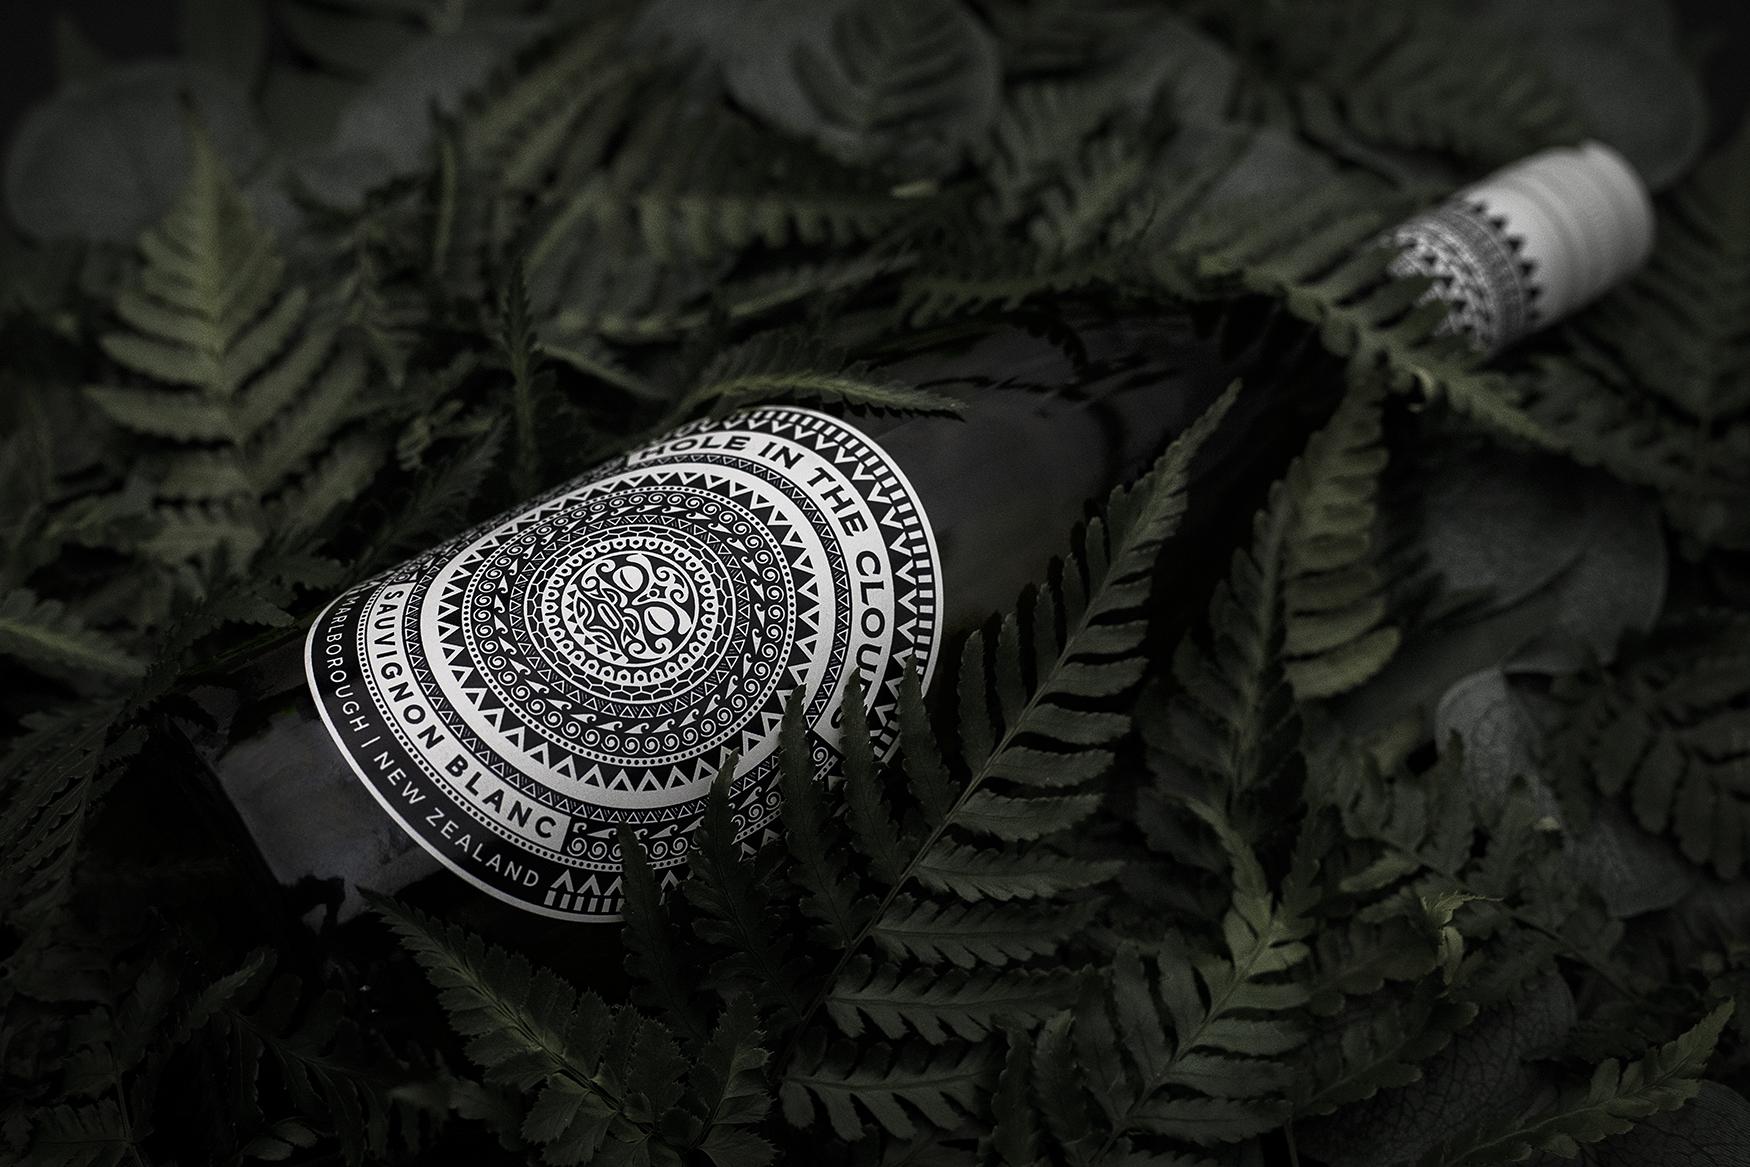 Masters of Brands Create Maori Inspired New Zealand Sauvignon Blanc